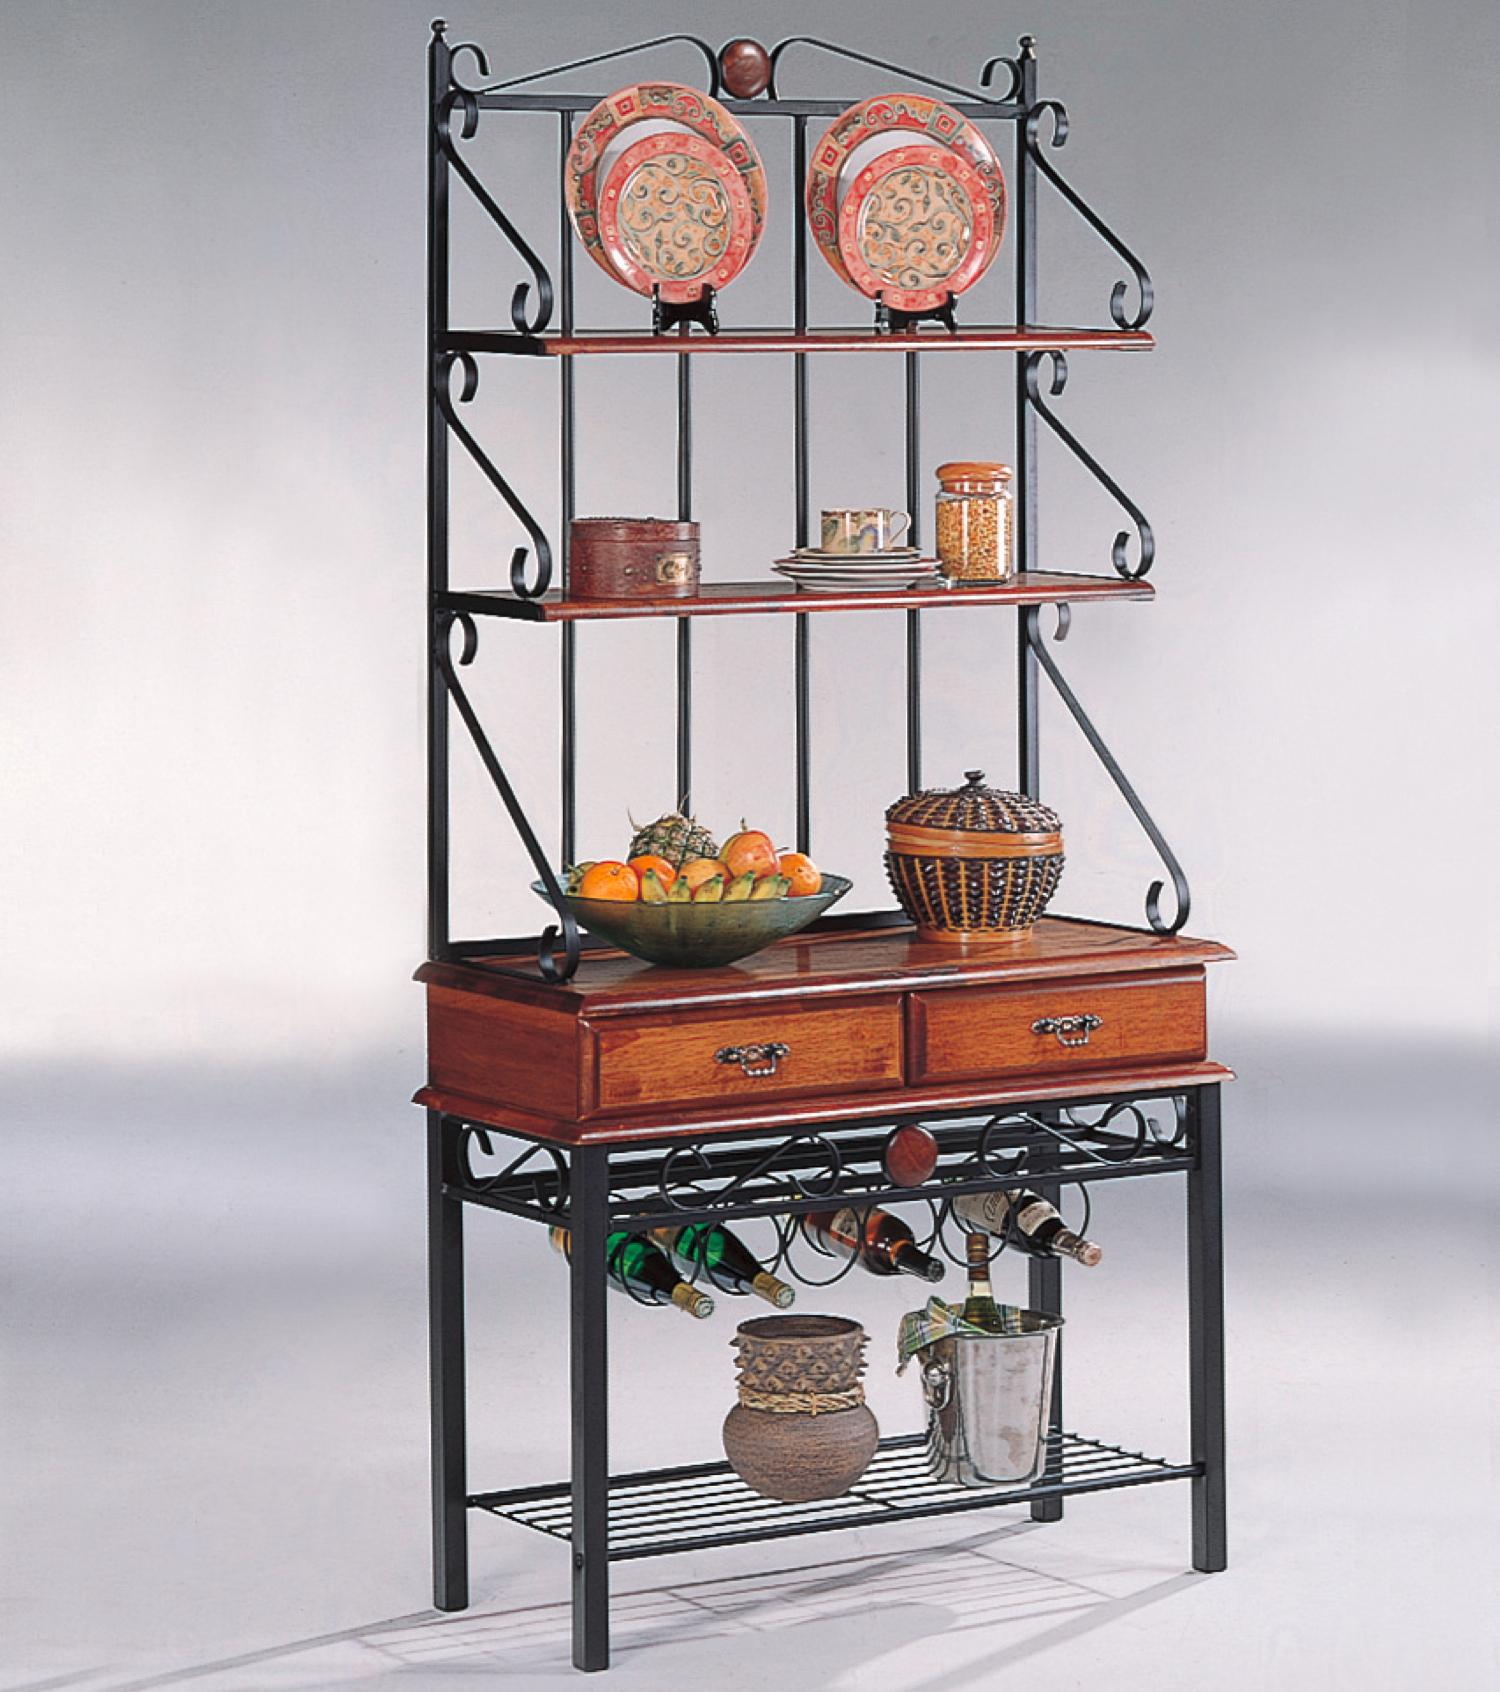 Coaster Accent Racks 3 Shelf Kitchen Cabinet With Wine Rack Value City Furniture Baker 39 S Racks